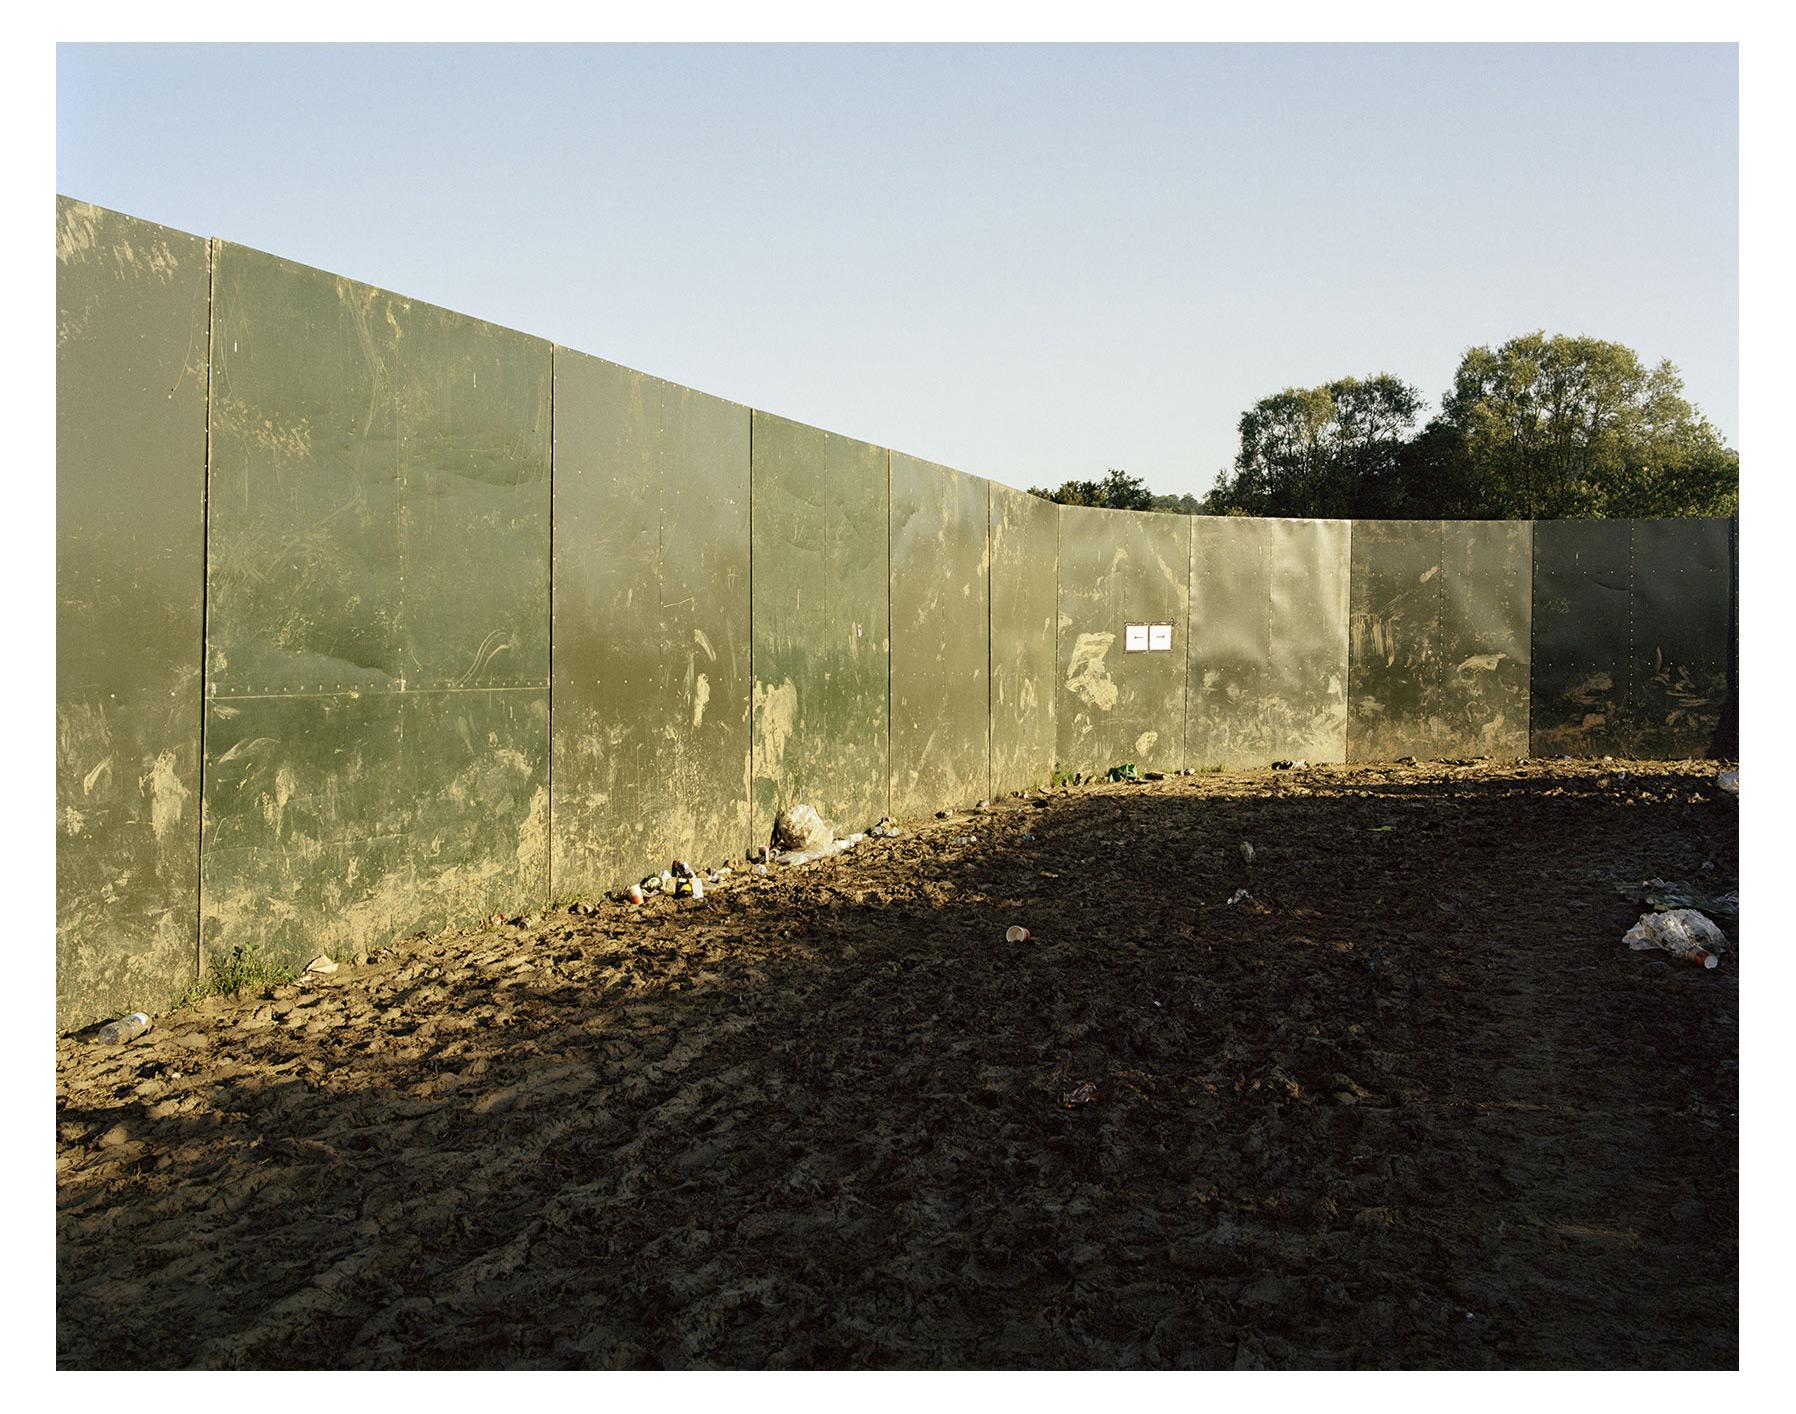 Glastonbury_festival_area_fence_UK.jpg